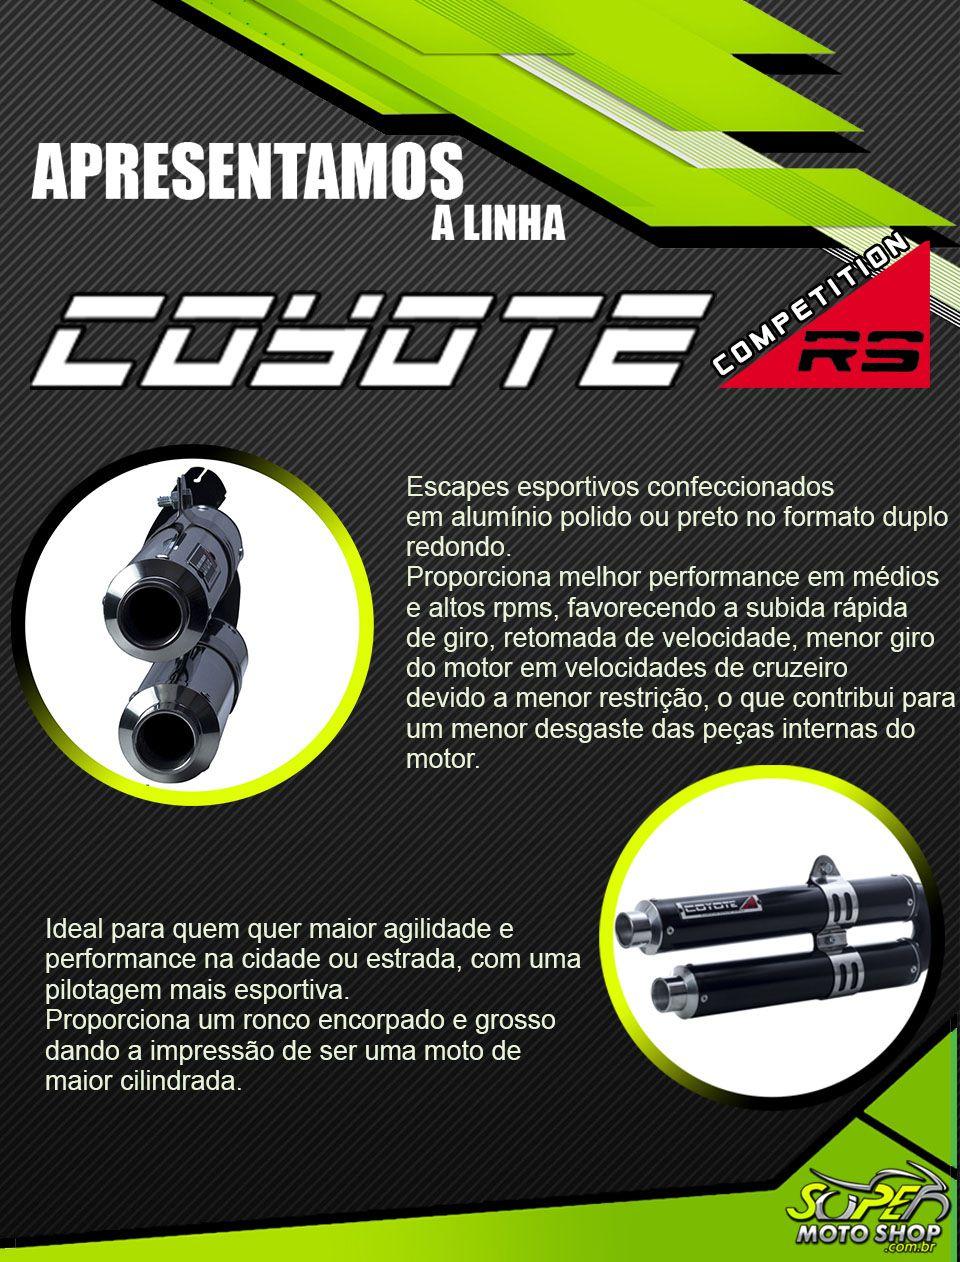 Escape / Ponteira Coyote Competition Duplo em Alumínio - Yes 125 - Suzuki